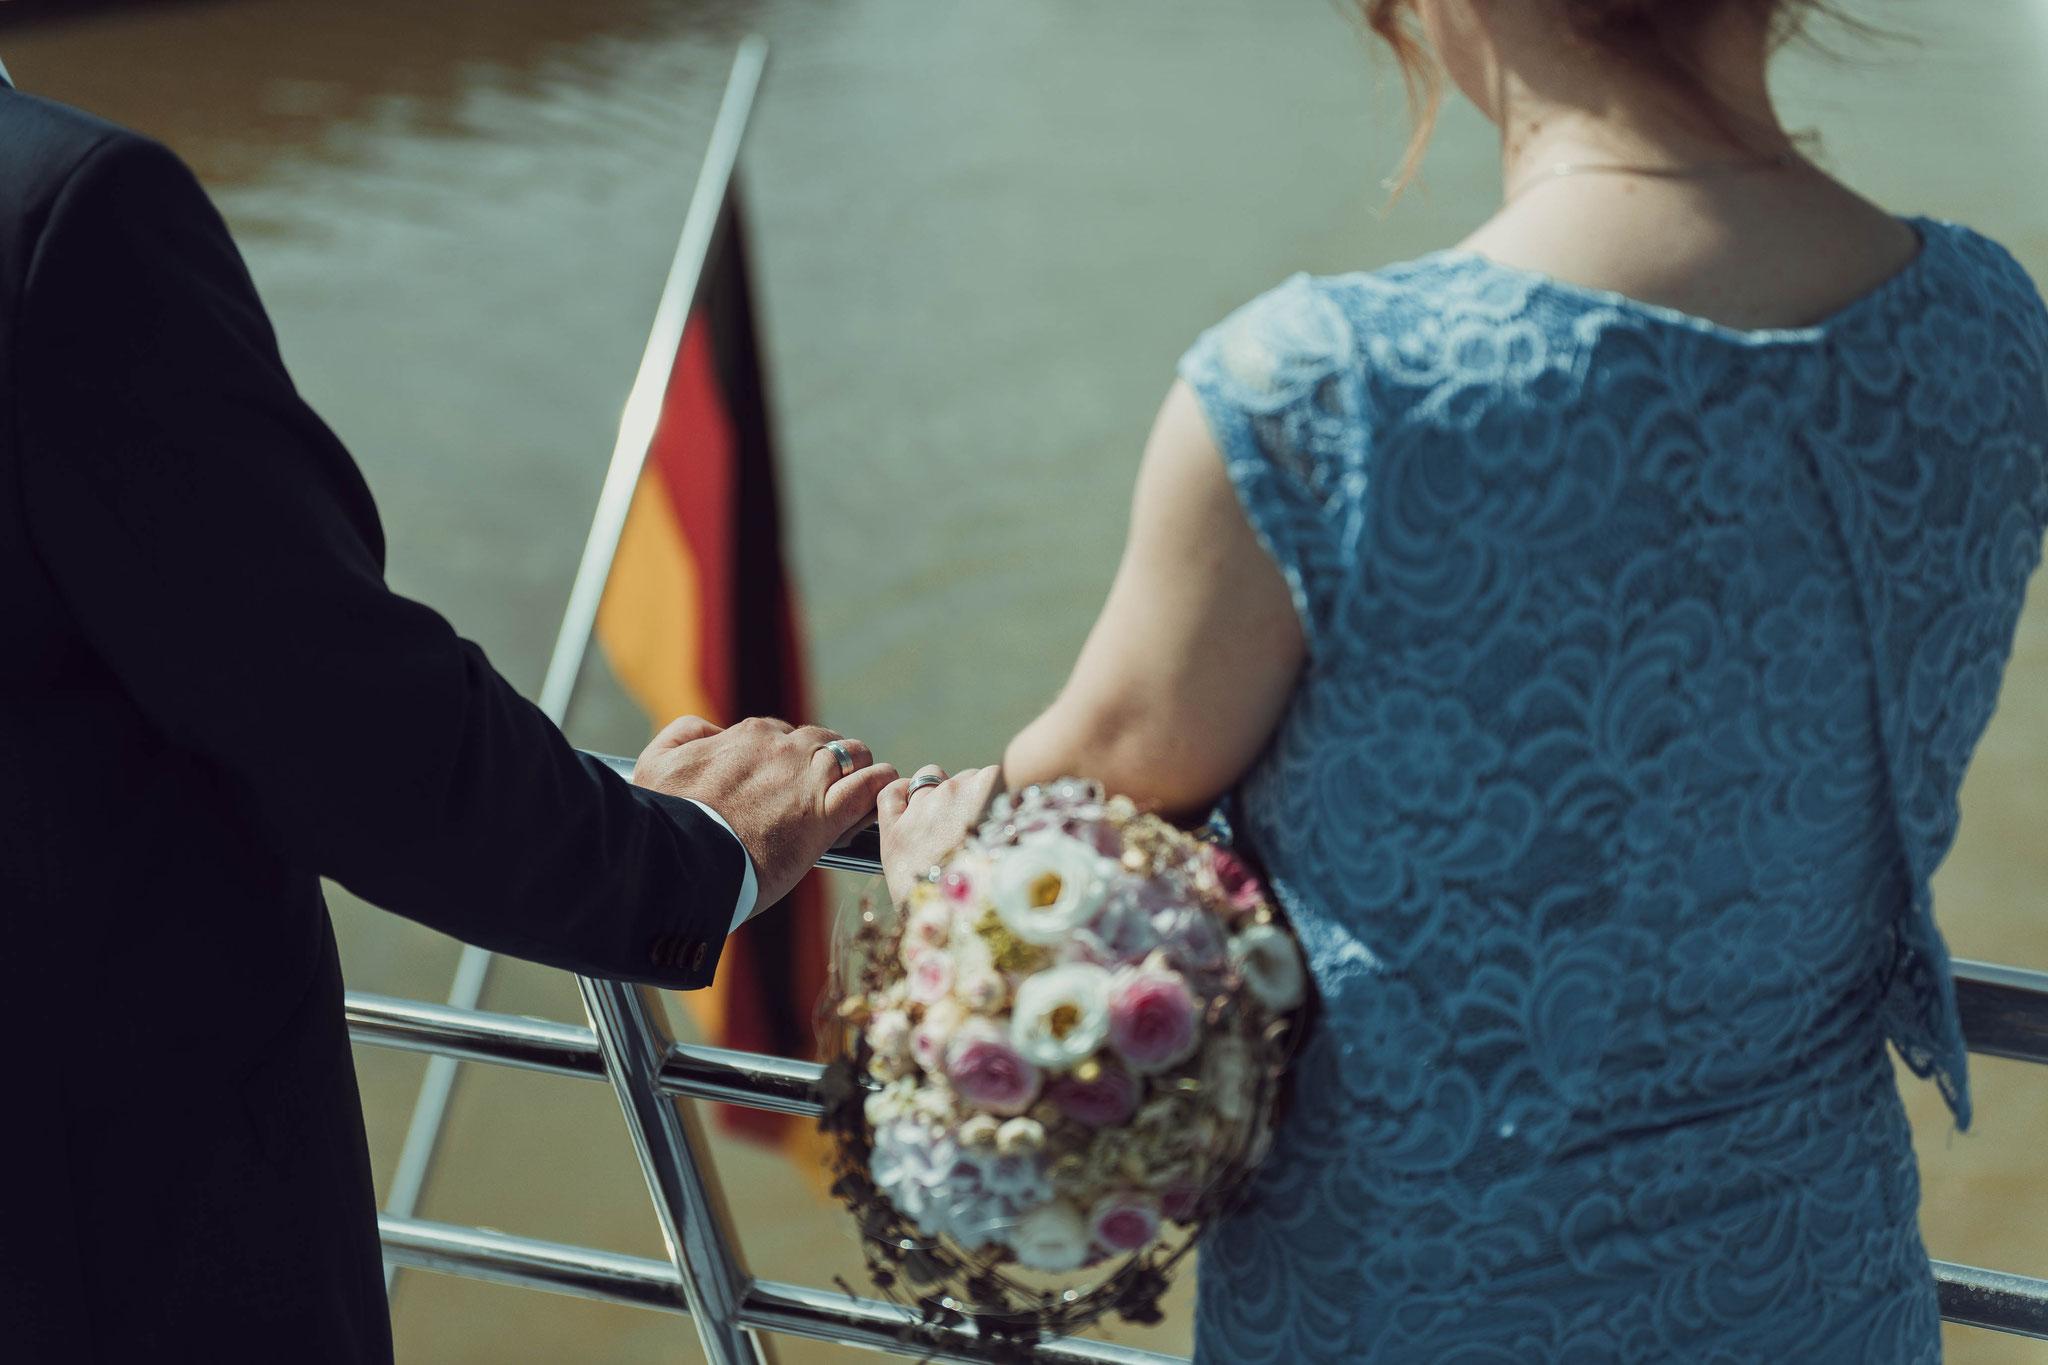 Brautpaar präsentieren stolz die Eheringe